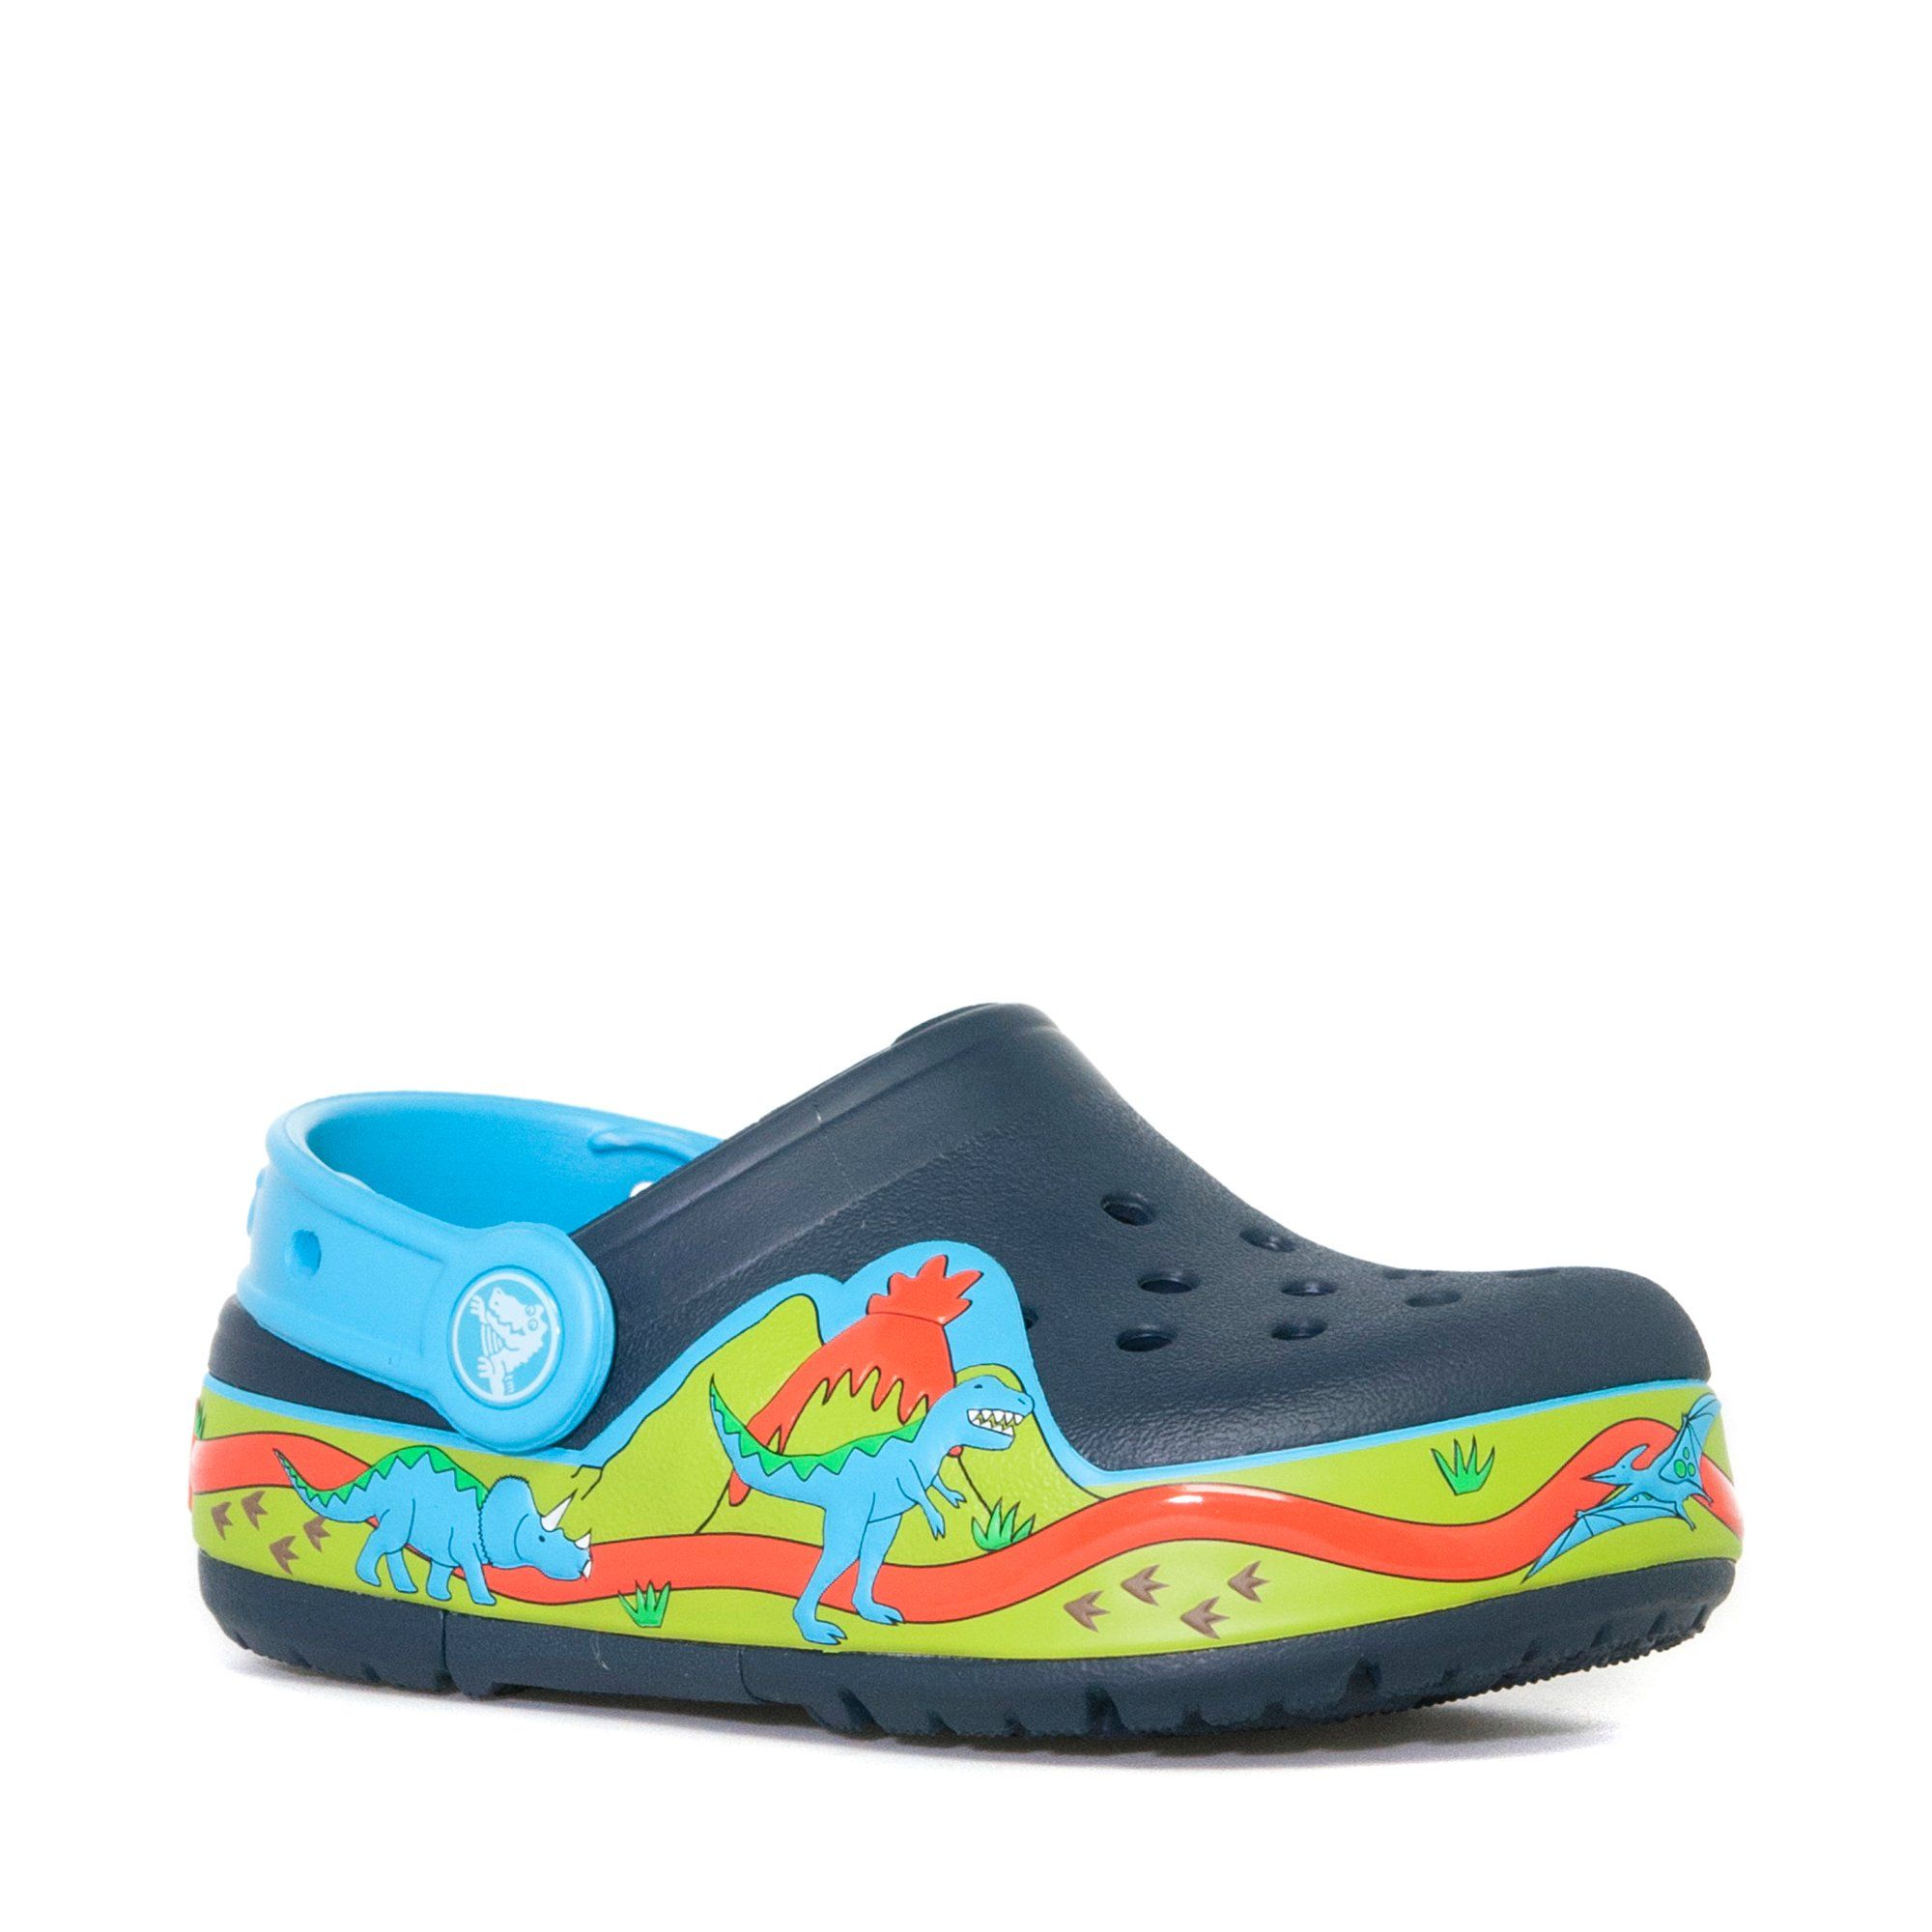 CROCS Kids' Crocslights Dinosaur Clog